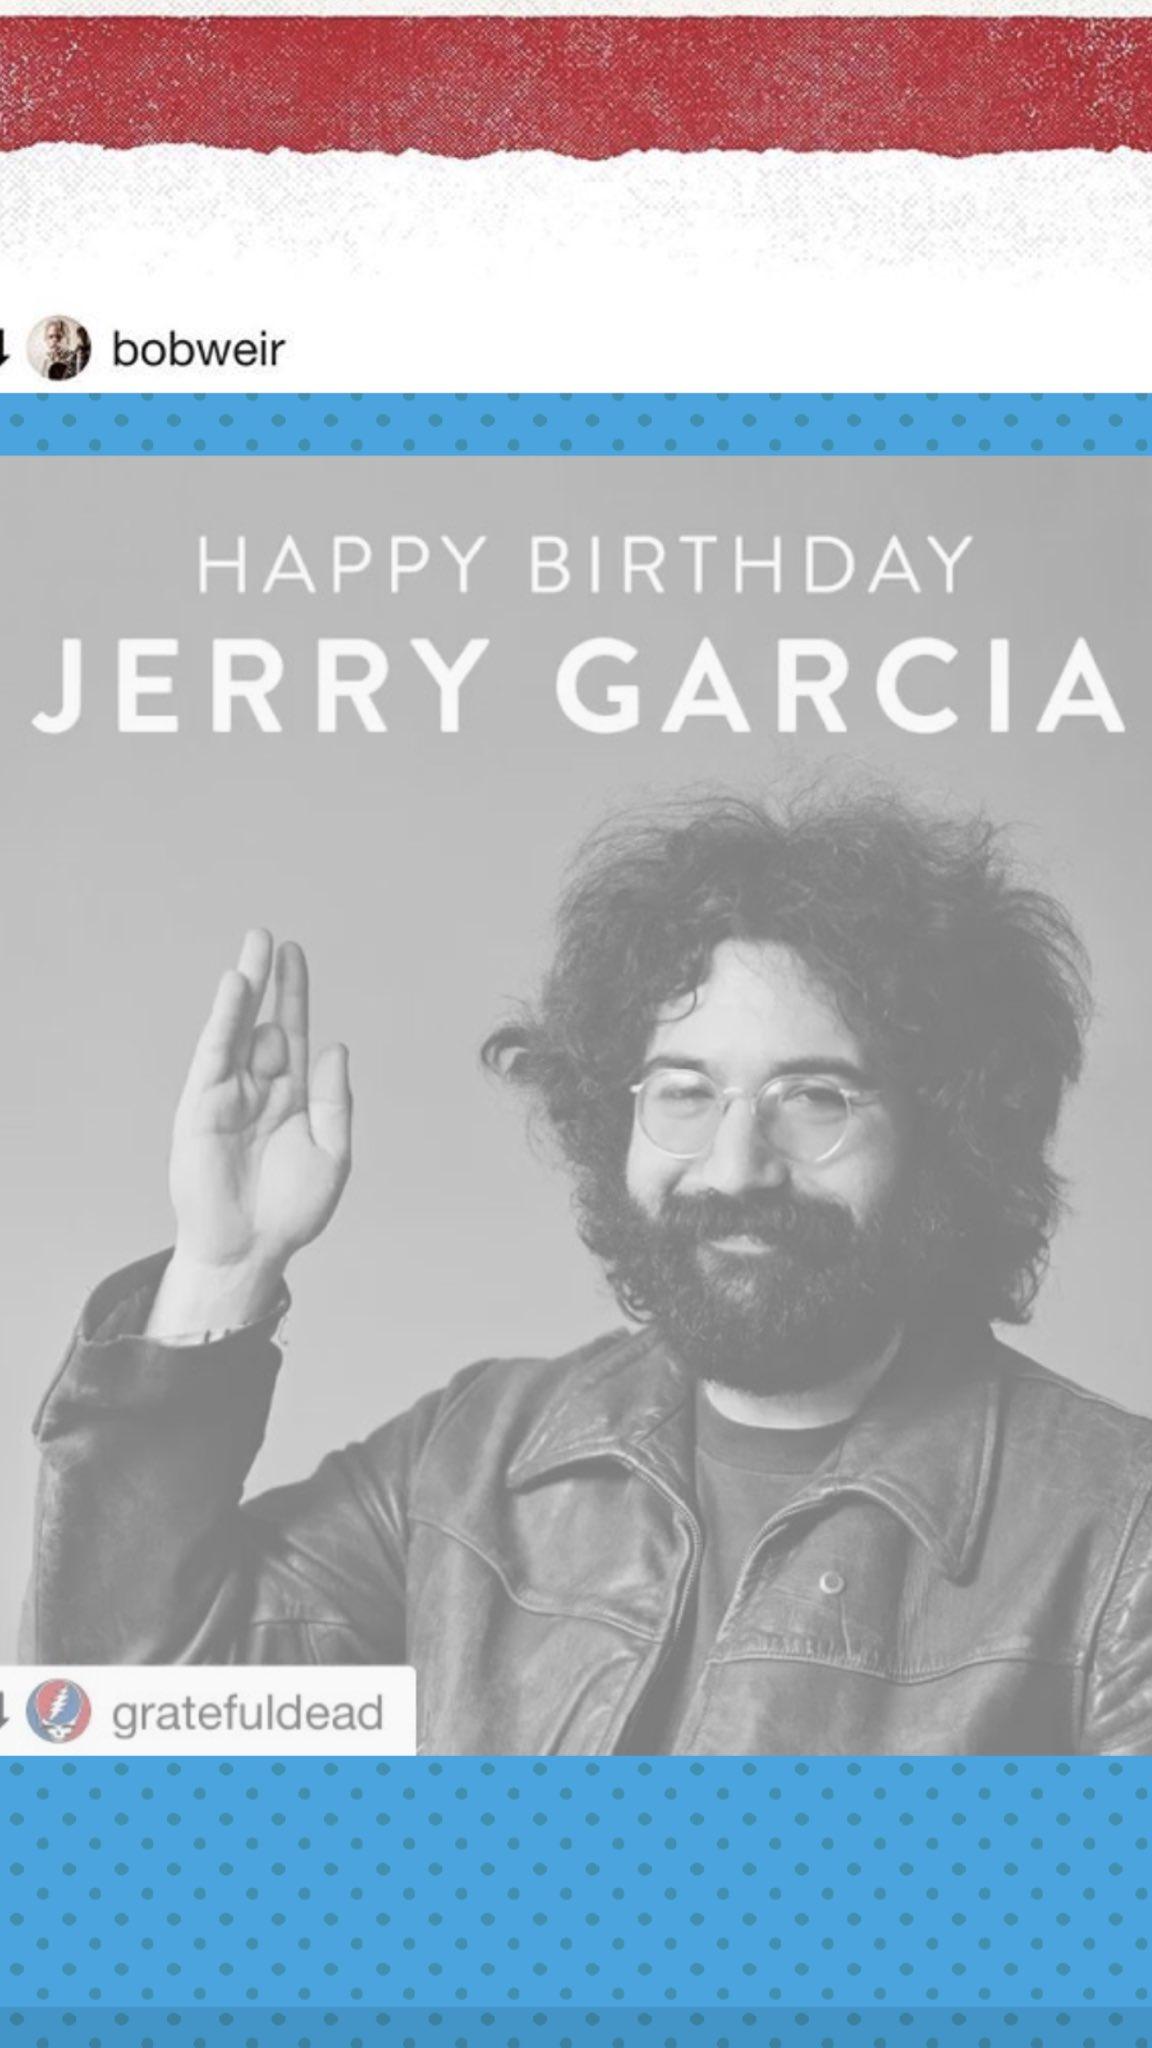 HAPPY BIRTHDAY ELI THERES A REASON Y U R SO SPECIAL ..... THANK U JERRY GARCIA